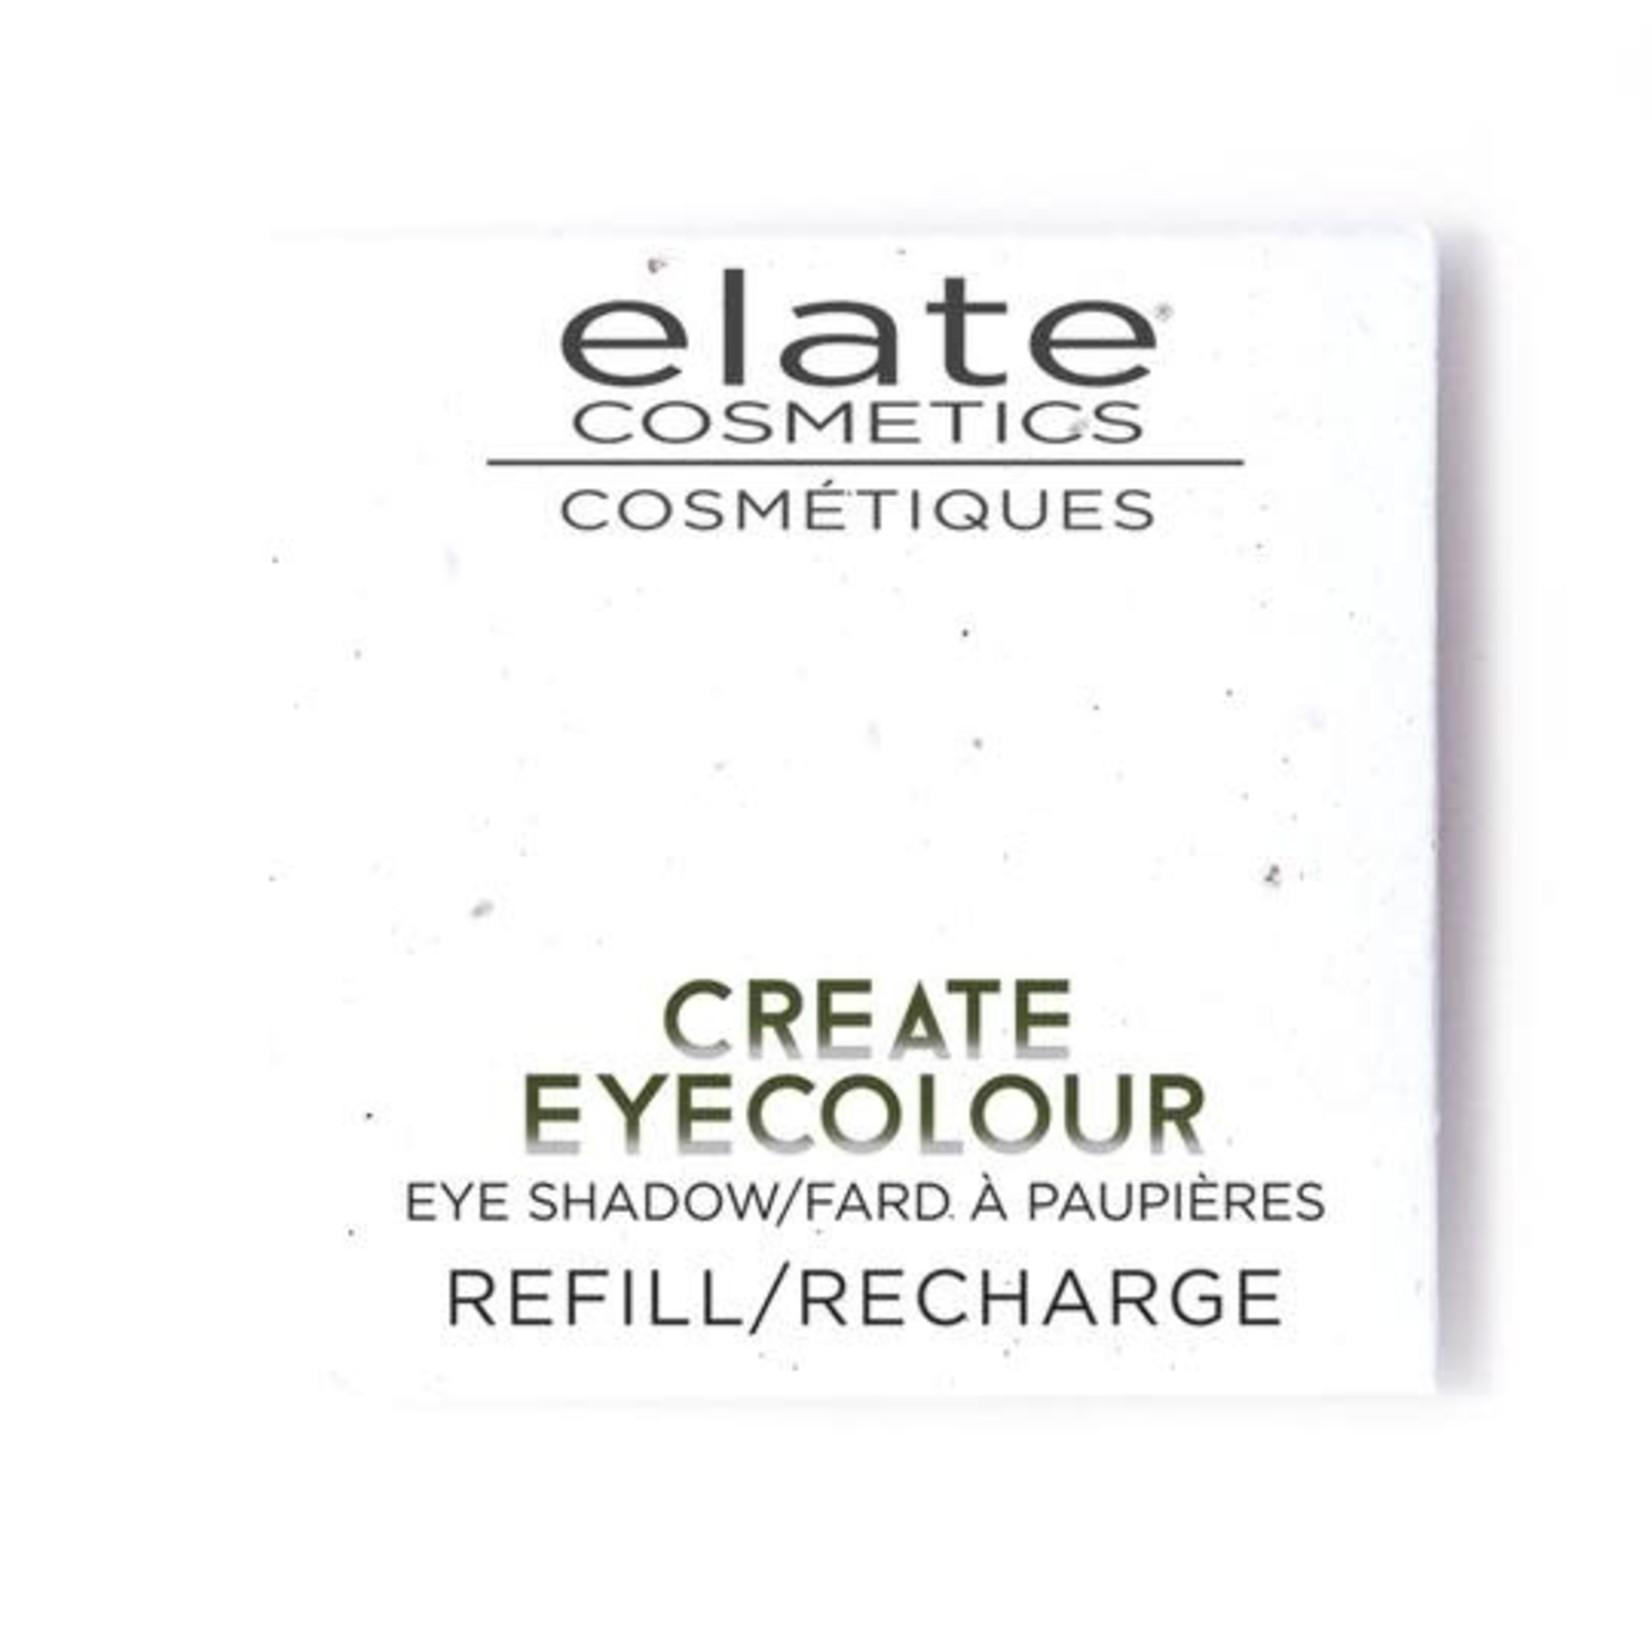 ELATE COSMETICS PRESSED EYECOLOUR - ASCEND